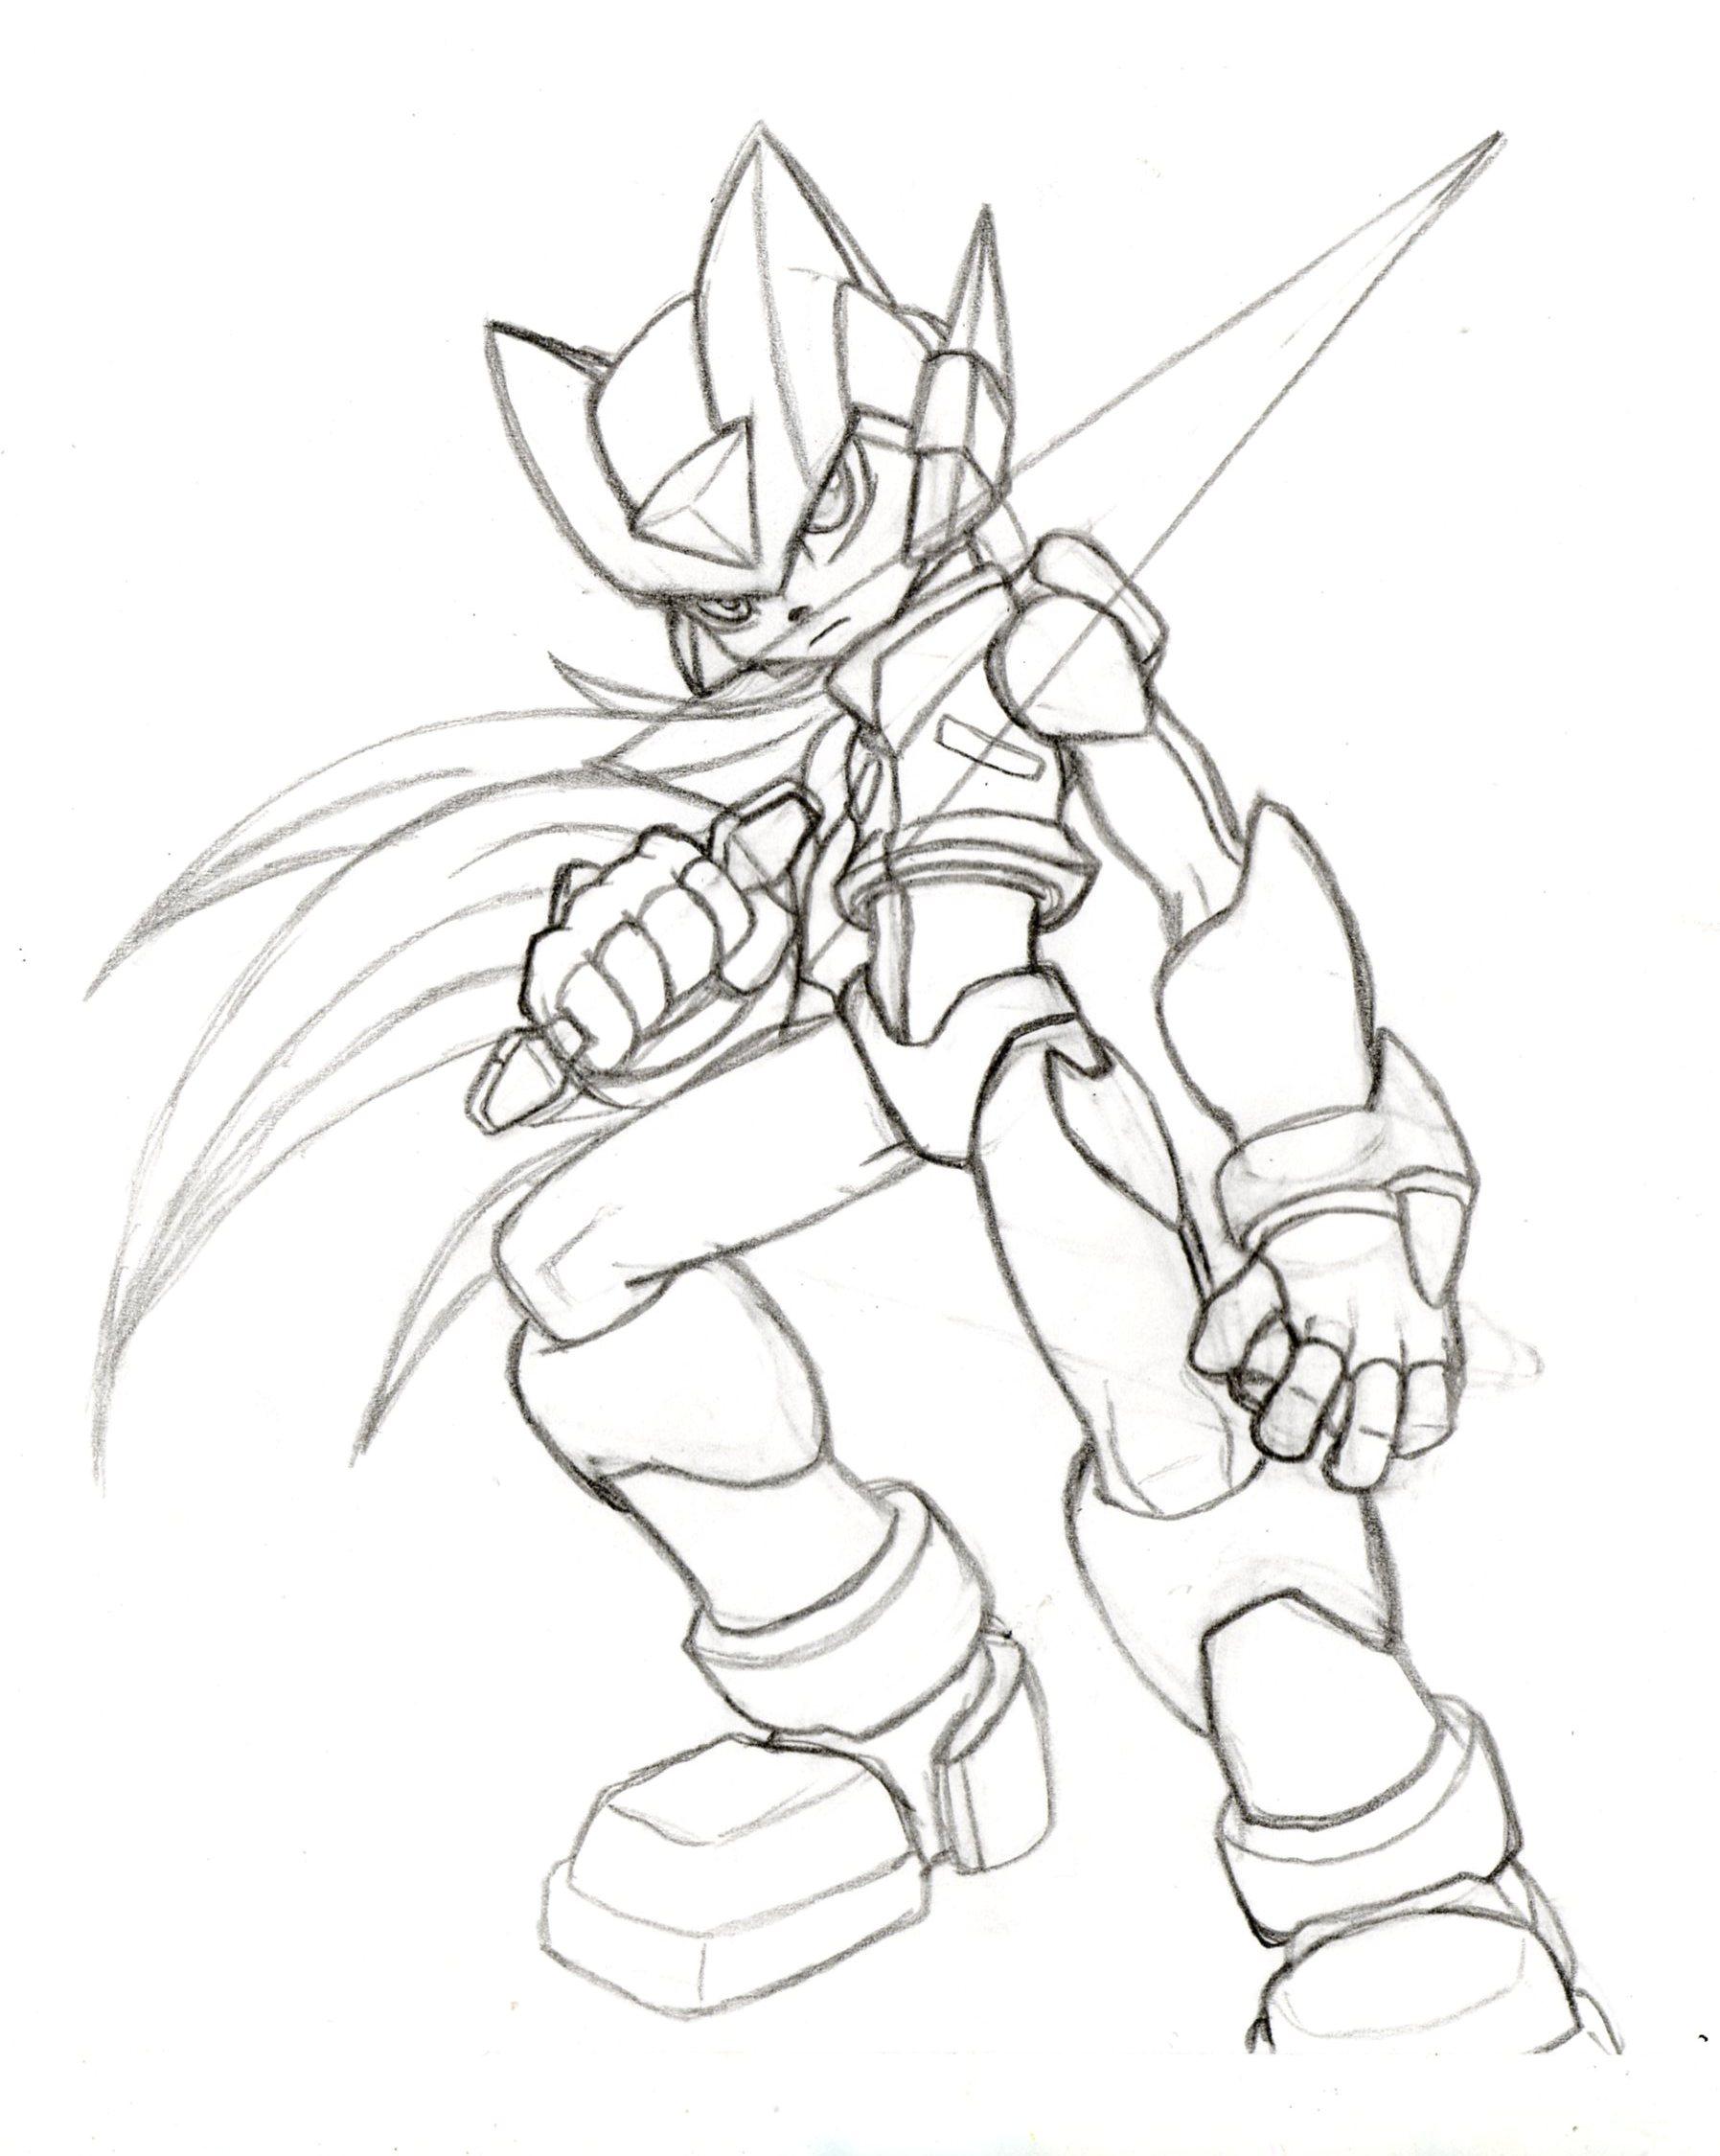 Megaman x coloring pages -  Theatombomb035 Megaman Zero Zero Sketch Preview By Theatombomb035